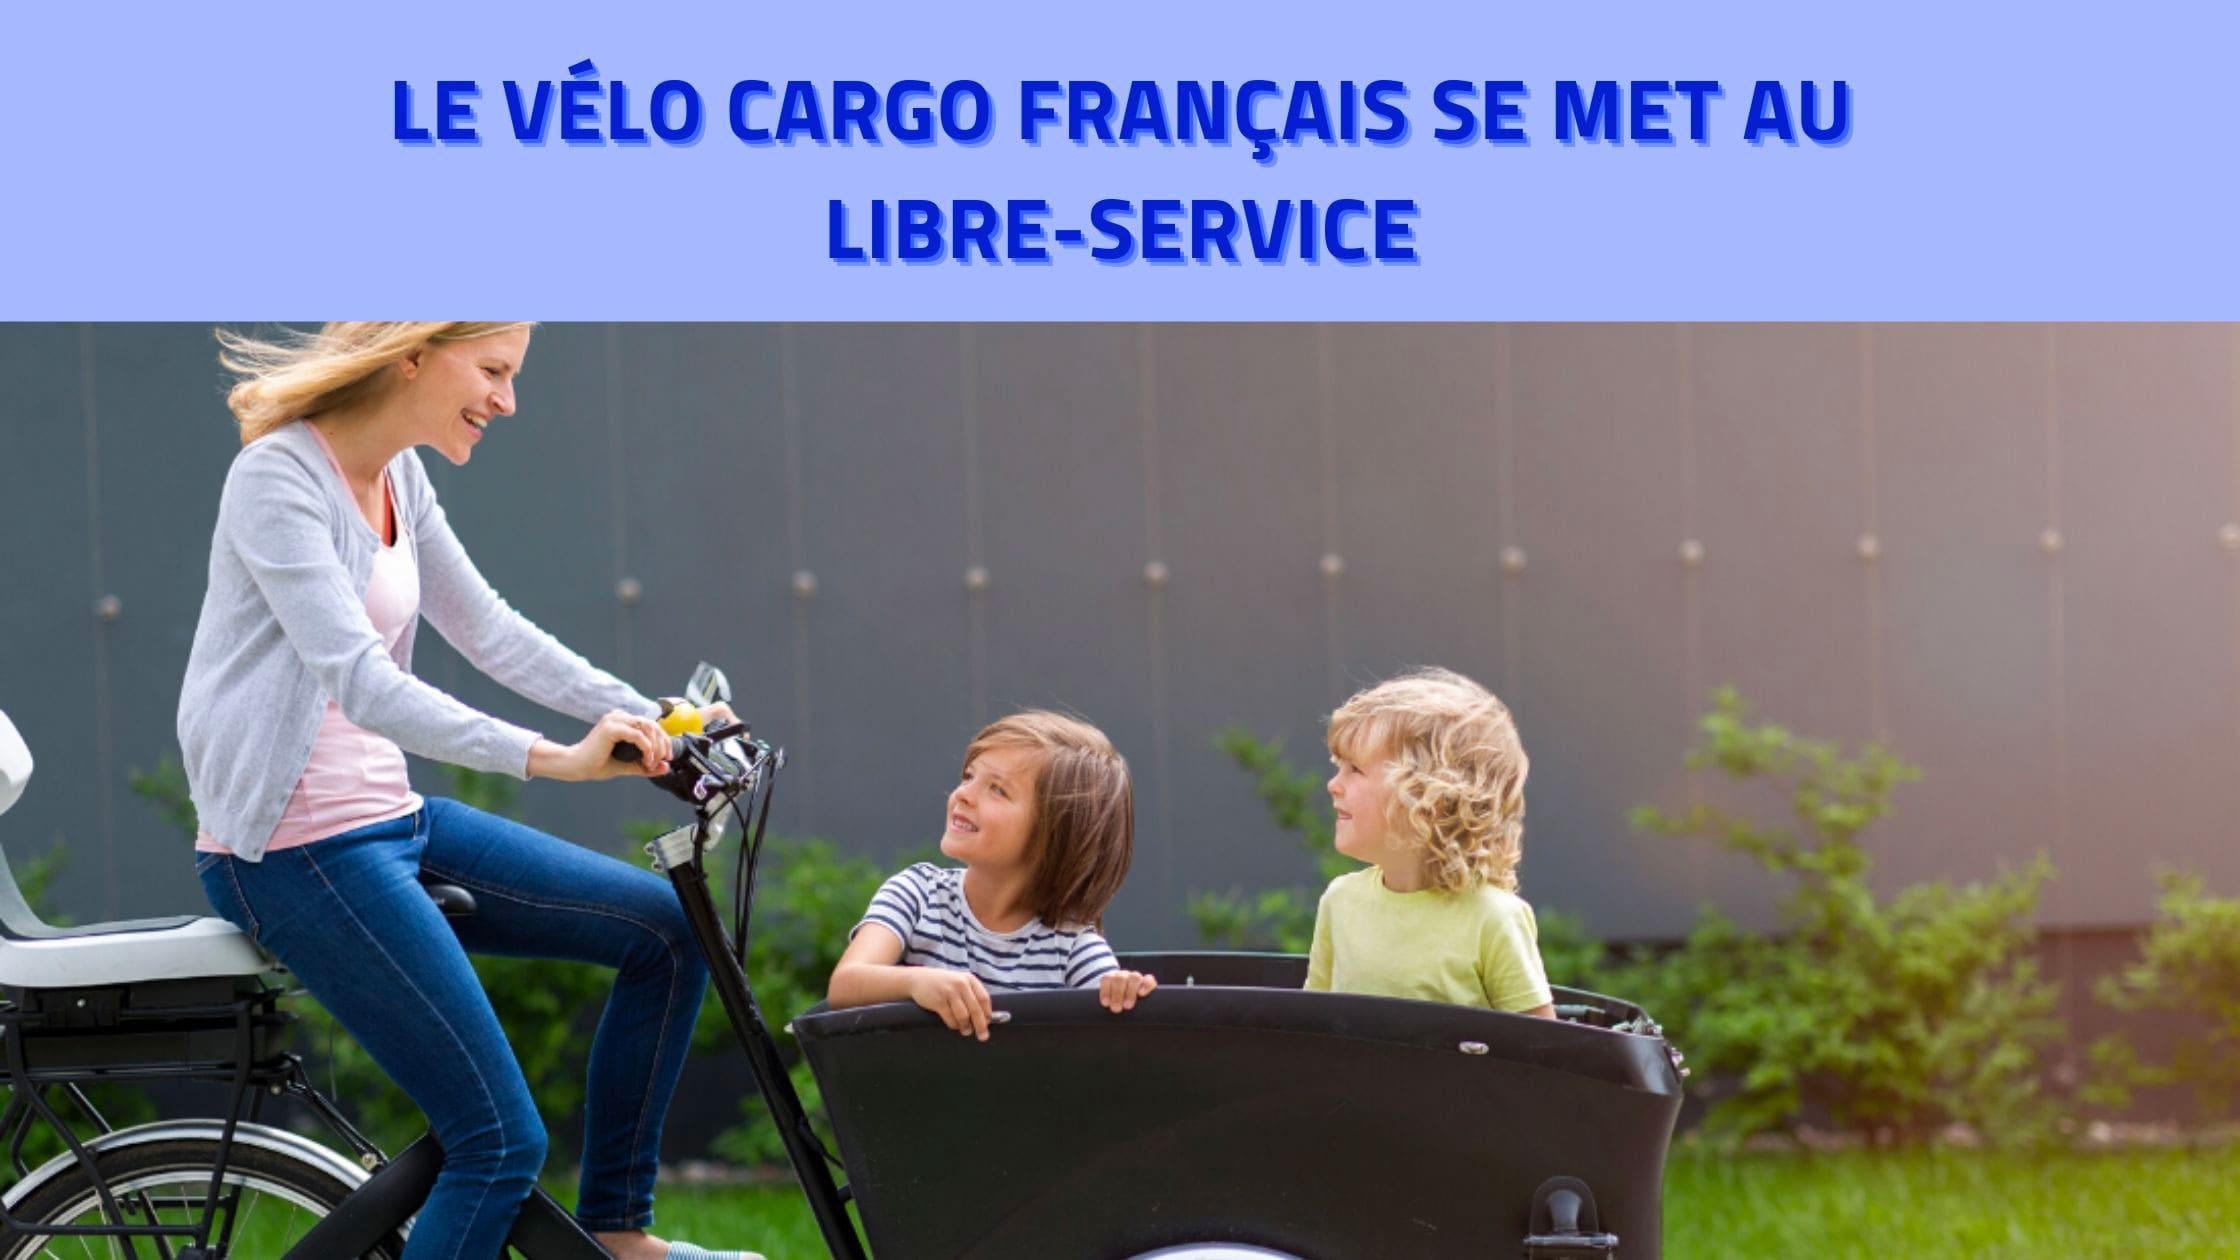 velo-cargo-francais-se-met-au-libre-service